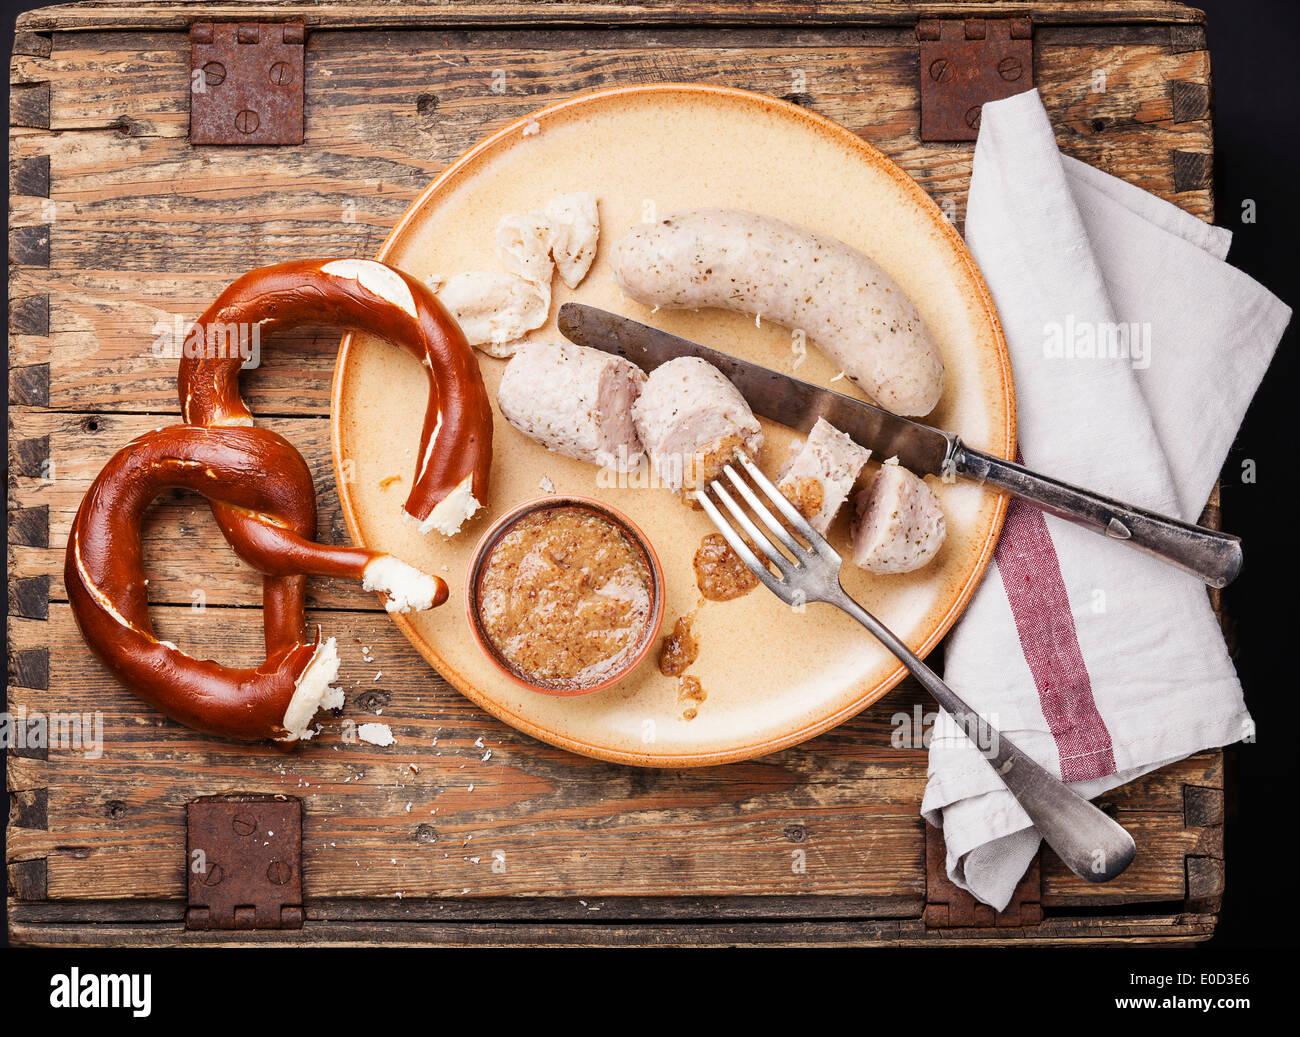 Snack-bavarois avec weisswurst saucisses blanches et bretzel Photo Stock